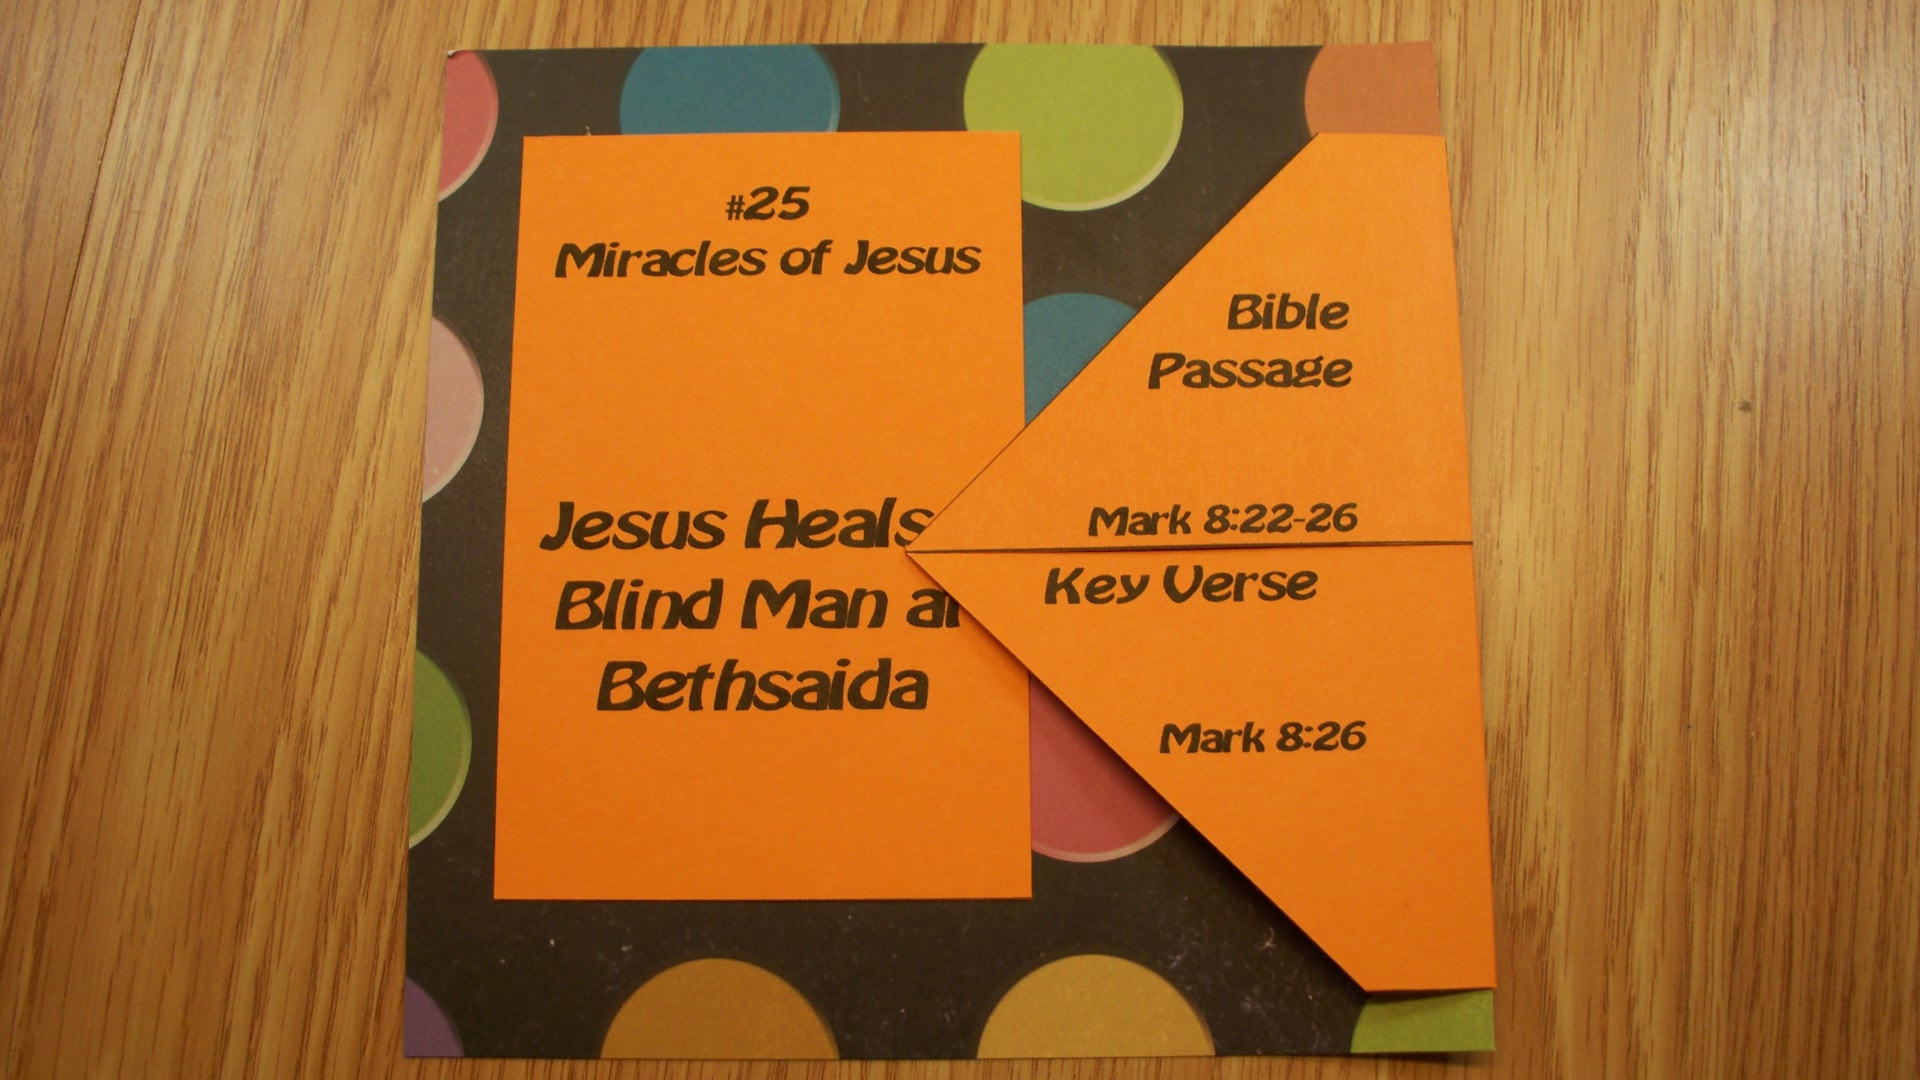 Jesus Heals A Blind Man At Bethsaida